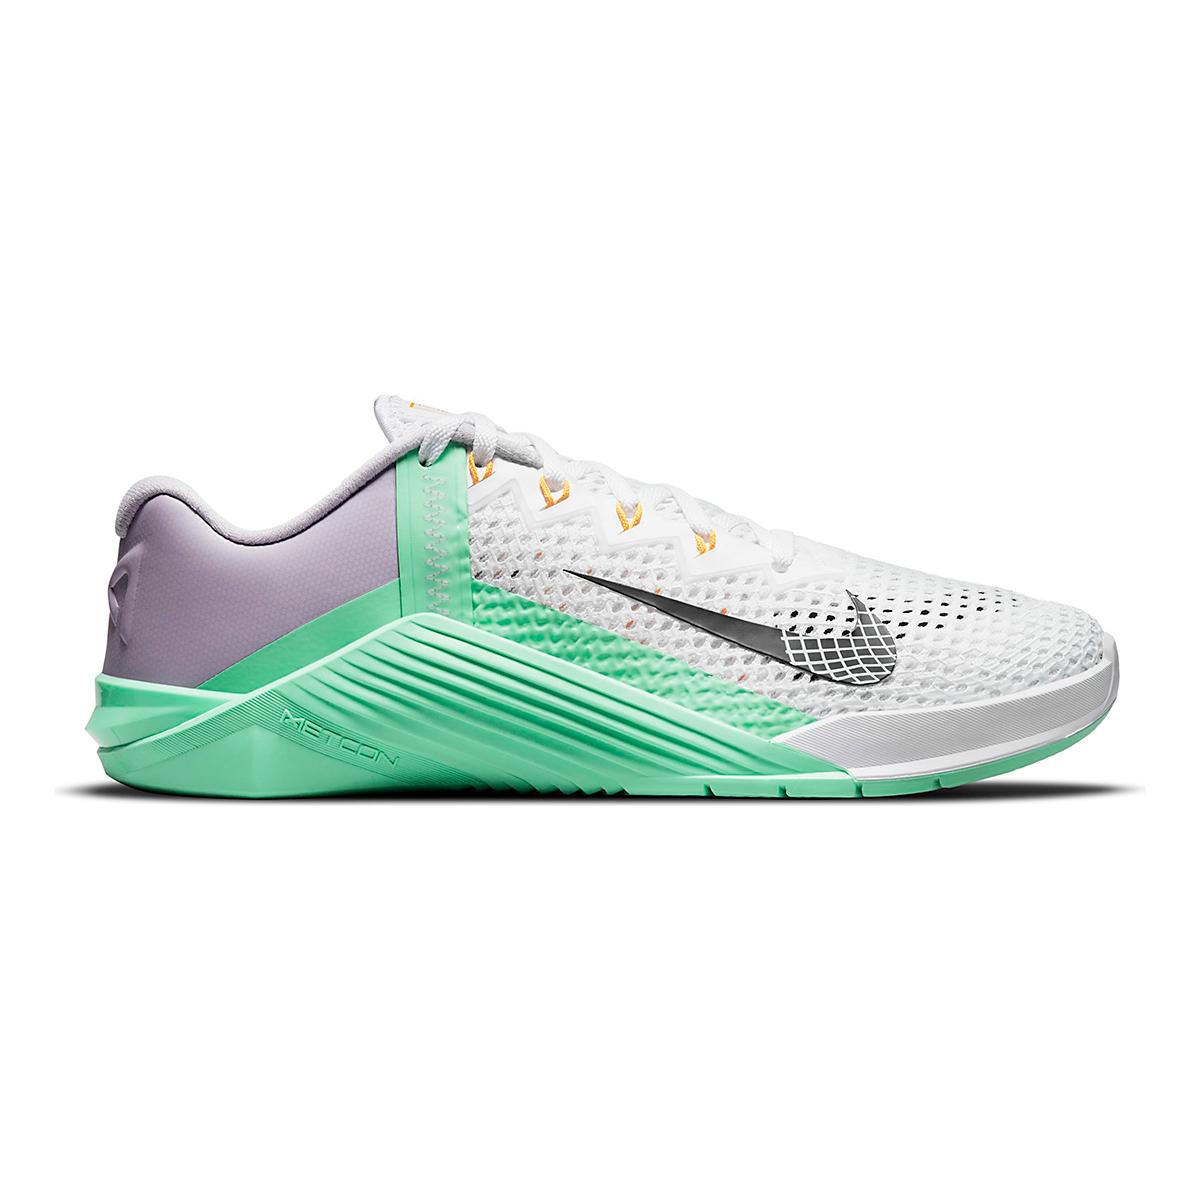 Women's Nike Metcon 6 Training Shoe - Color: White/Smoke Grey/Infinite Lilac - Size: 5 - Width: Regular, White/Smoke Grey/Infinite Lilac, large, image 1